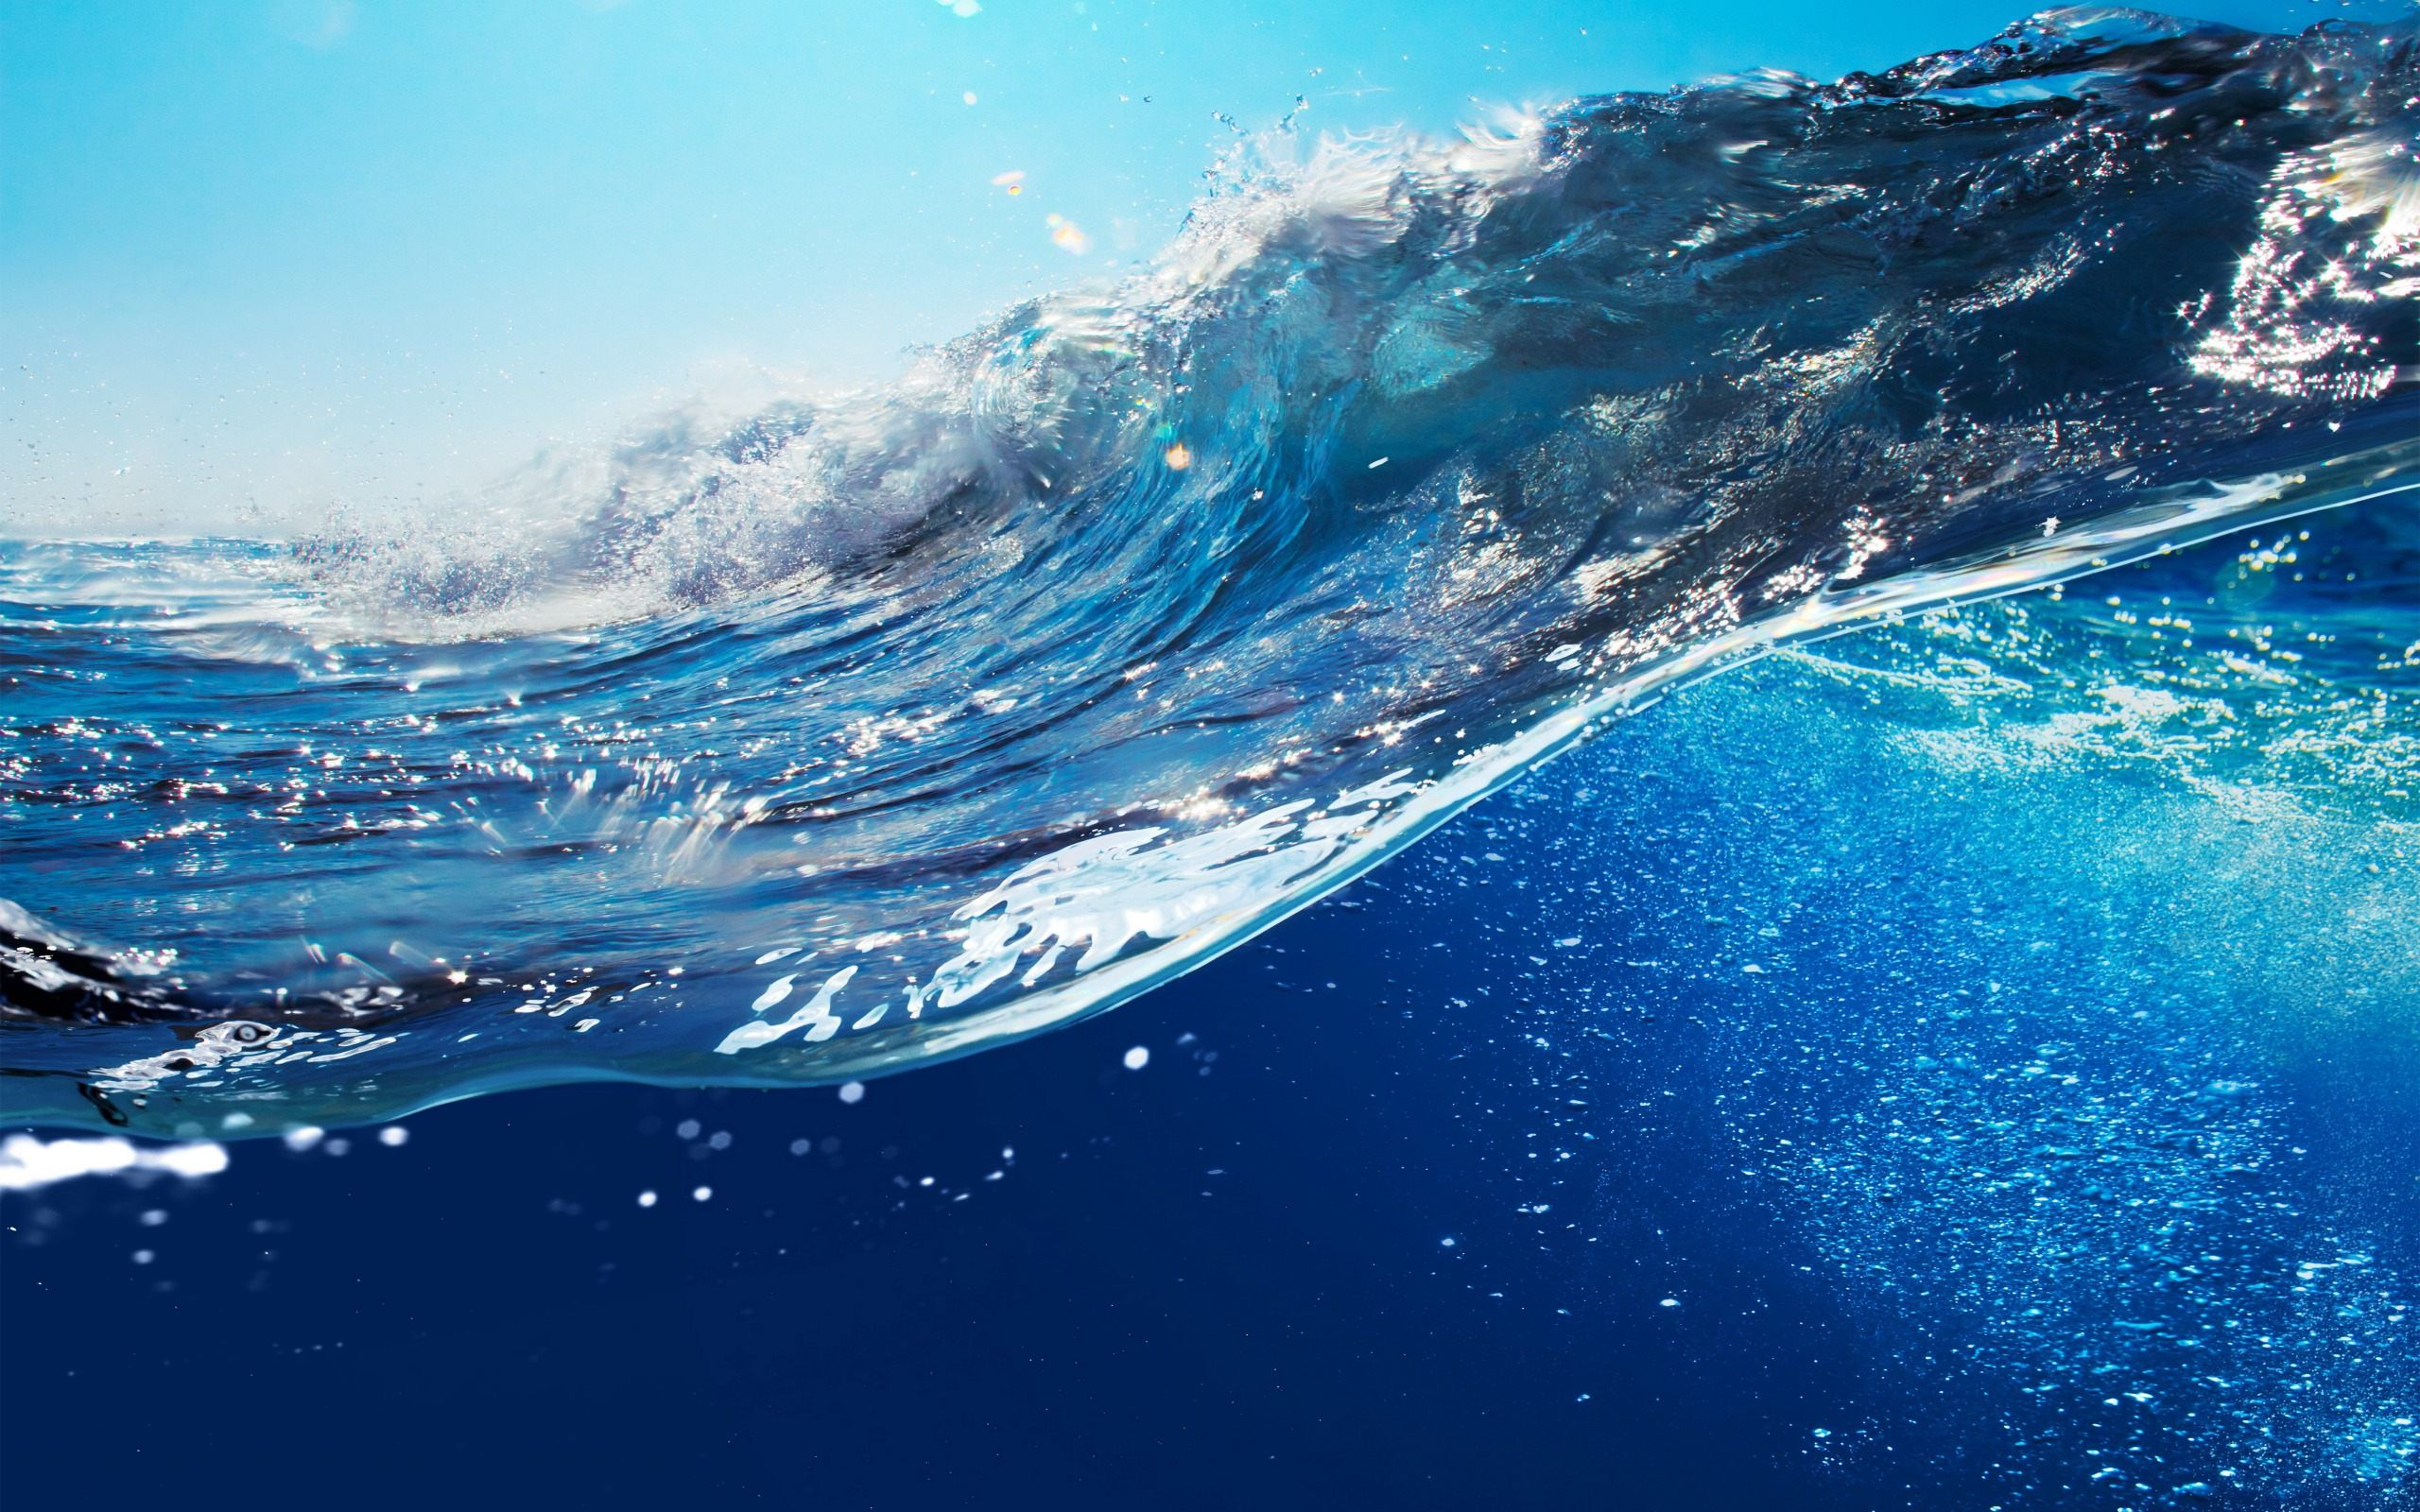 Celebrations 98 Ocean wallpaper, Sea waves, Waves wallpaper